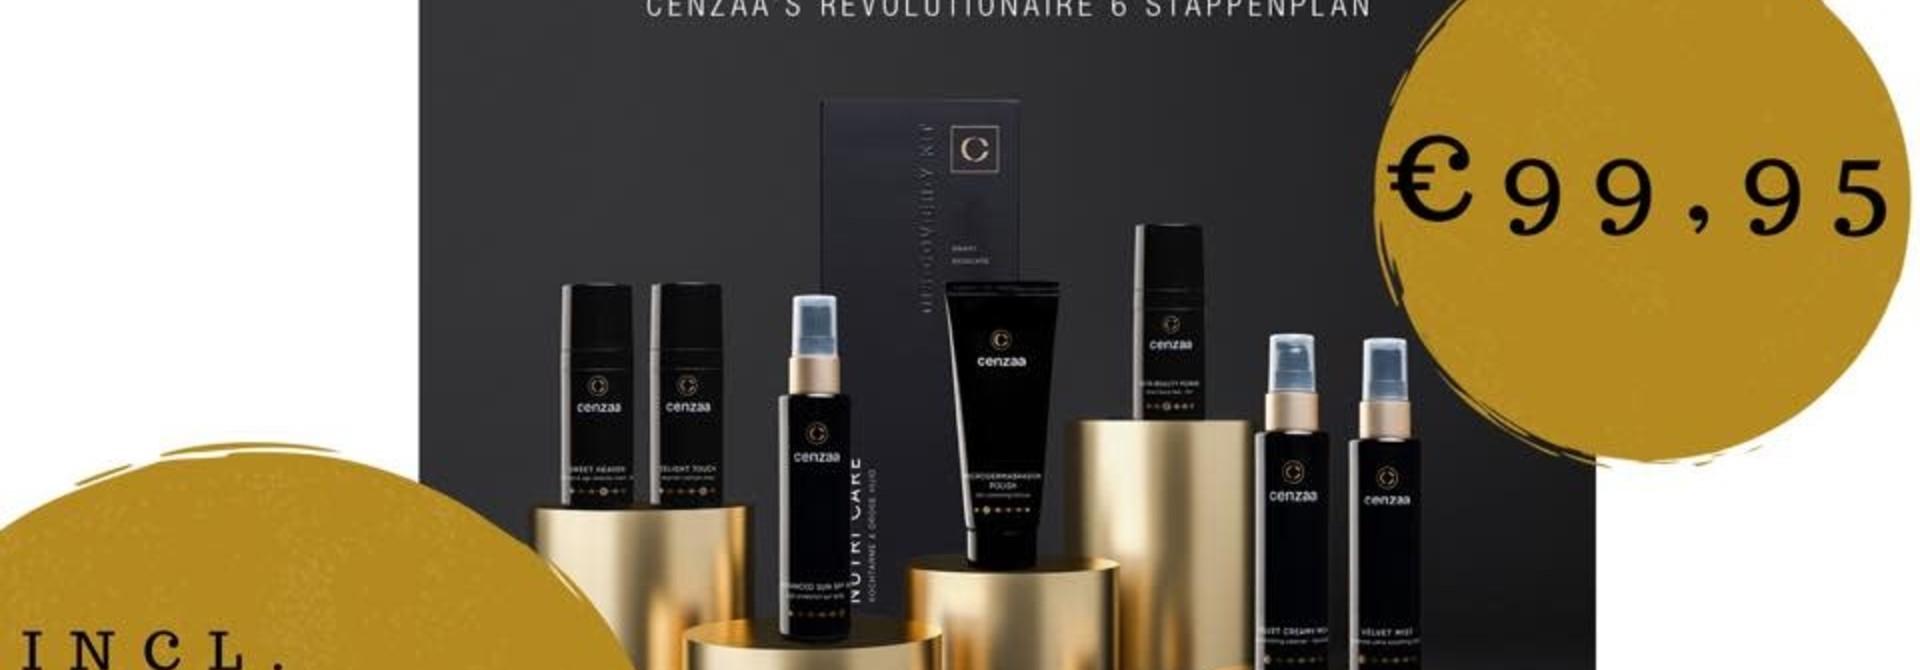 Cenzaa Discovery Kit - Ultra Moist 3.0